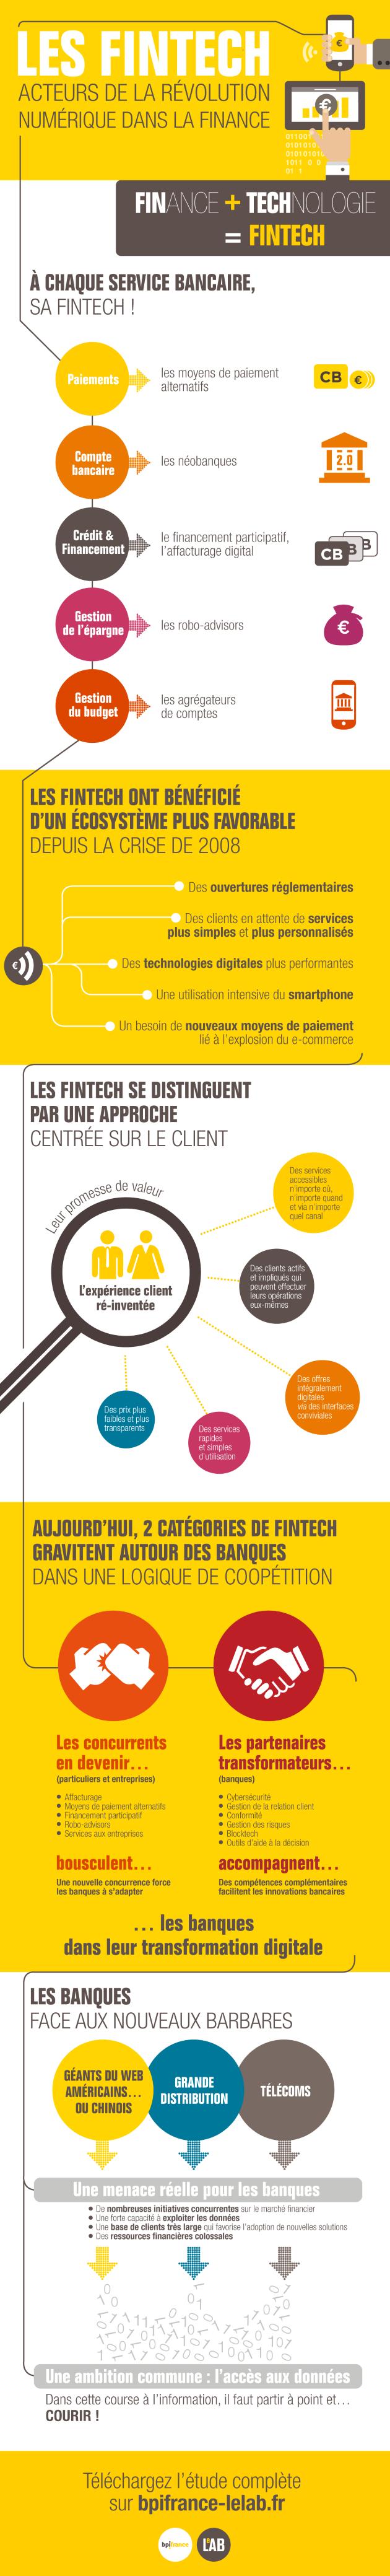 Infographie Fintech BPI